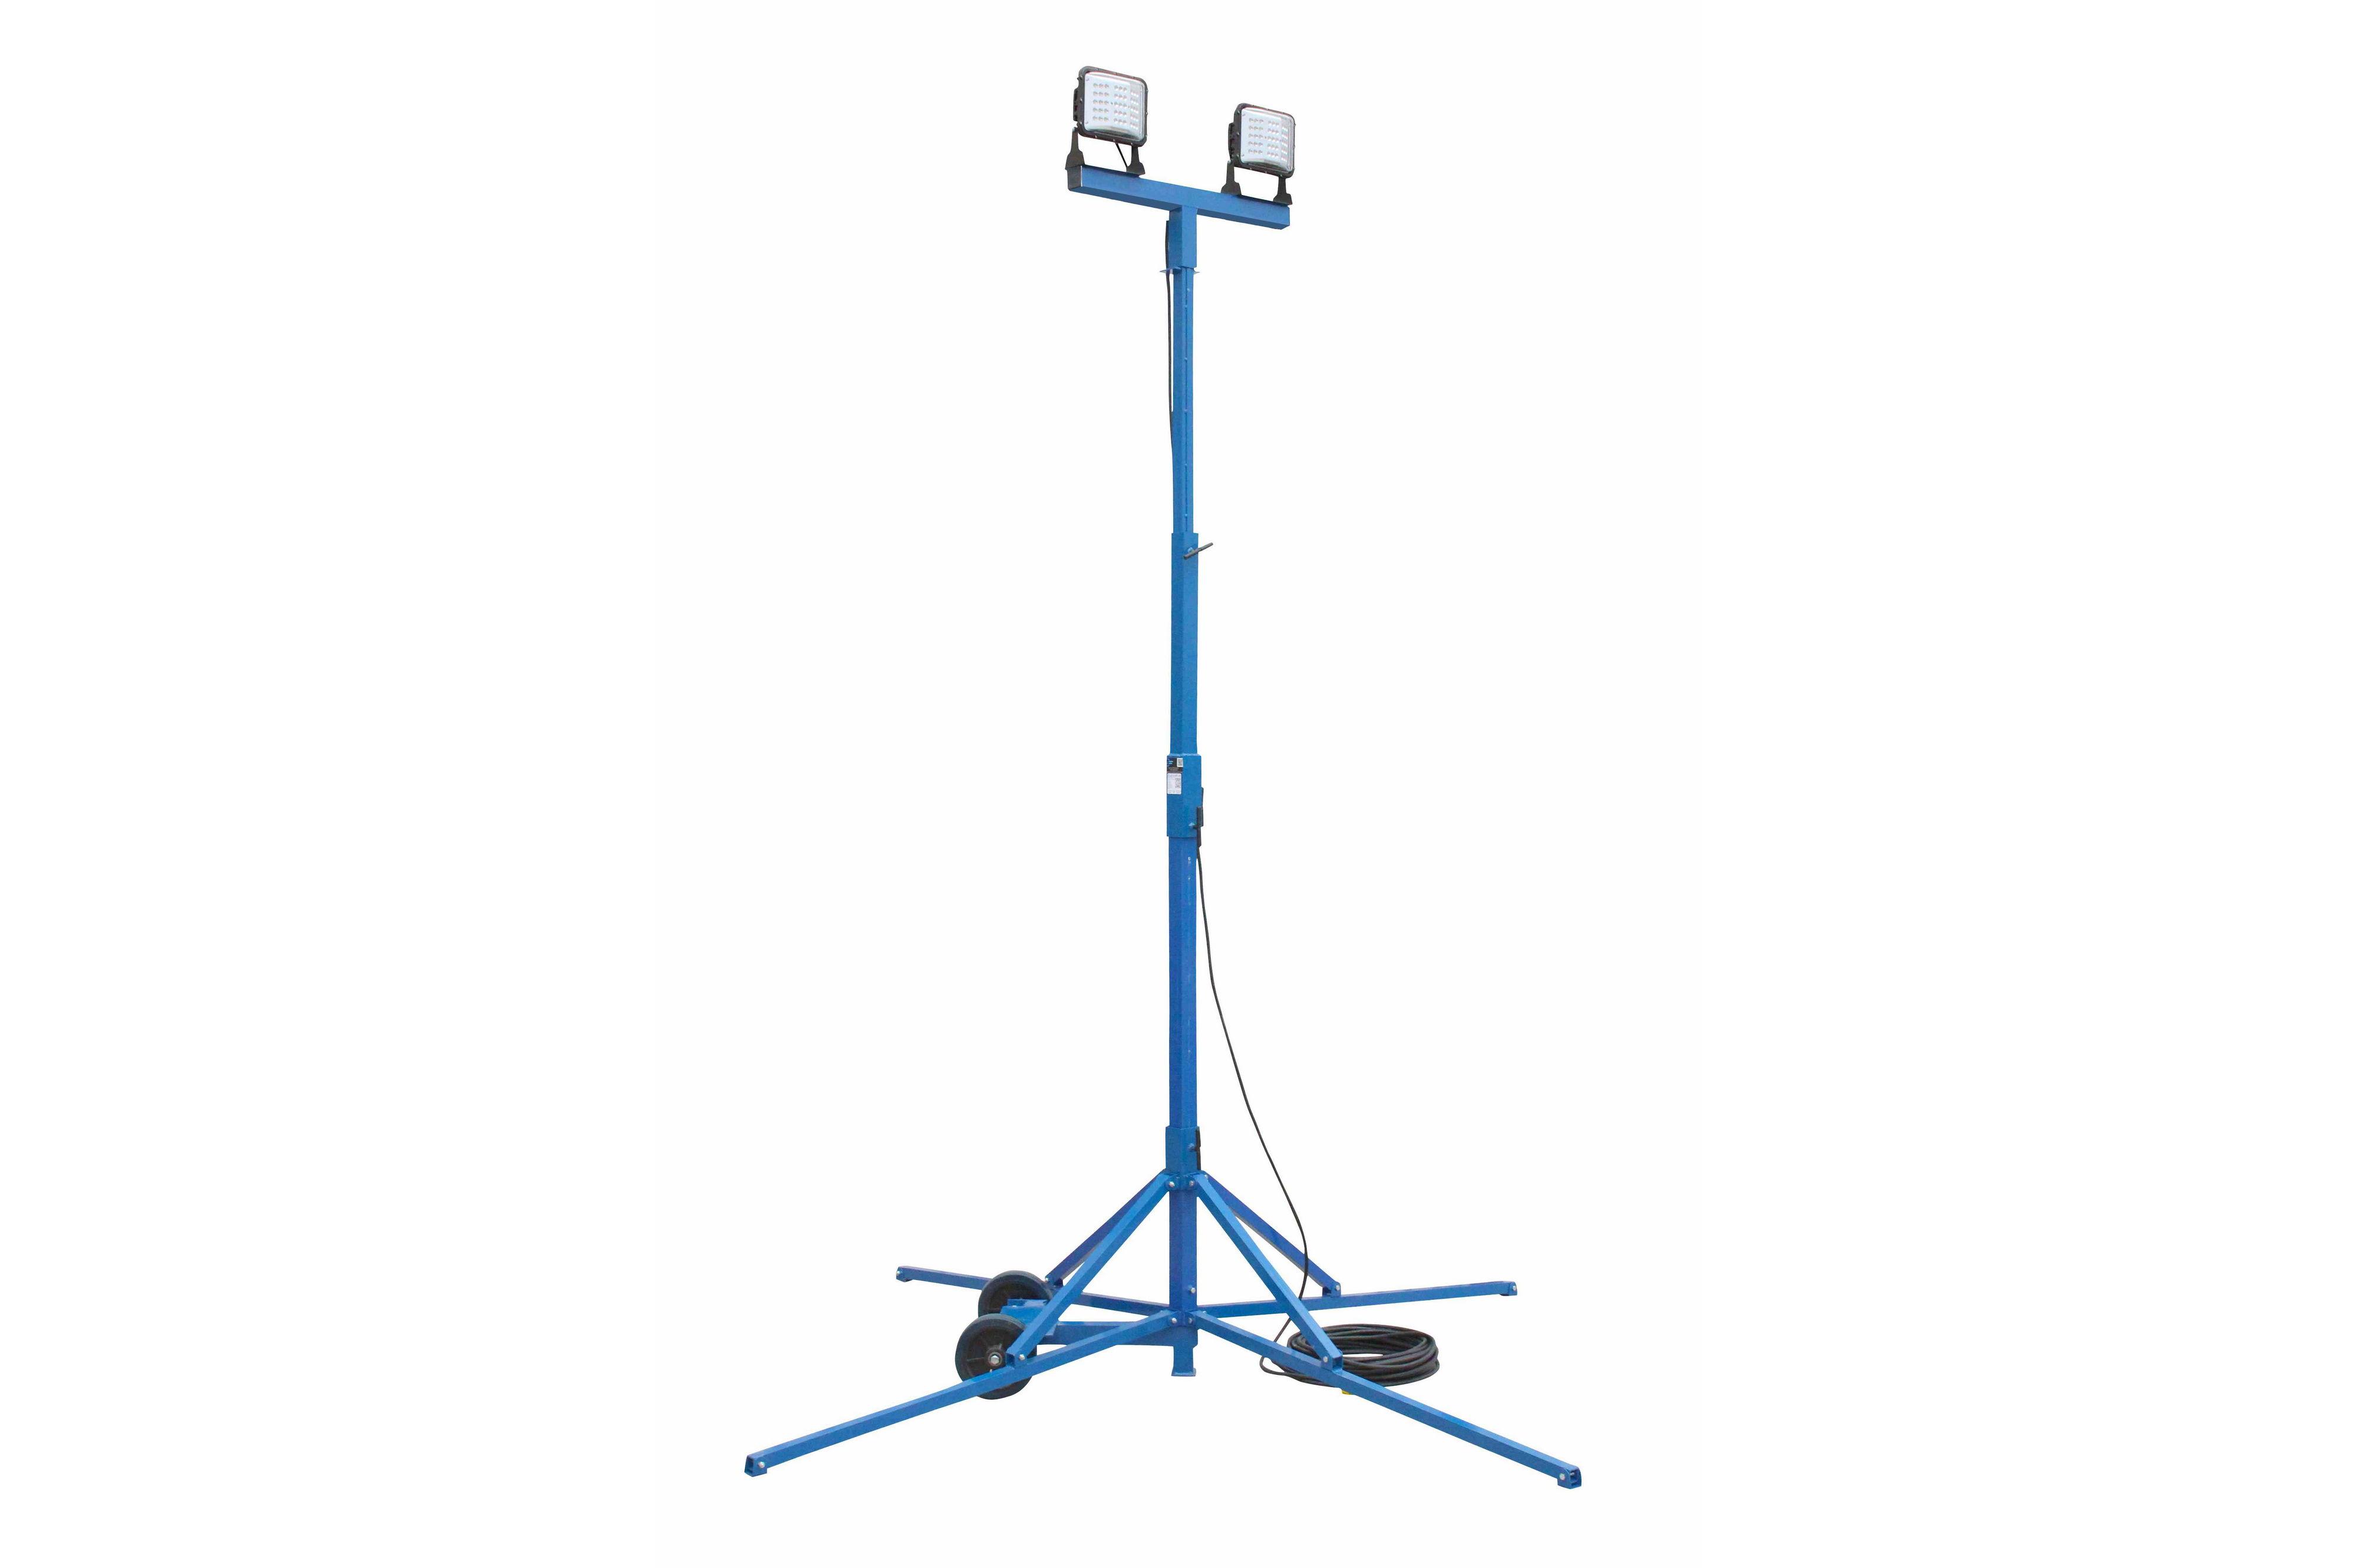 halogen work light wiring diagram 02 trailblazer stereo 120 watt led area quadpod fixture 500